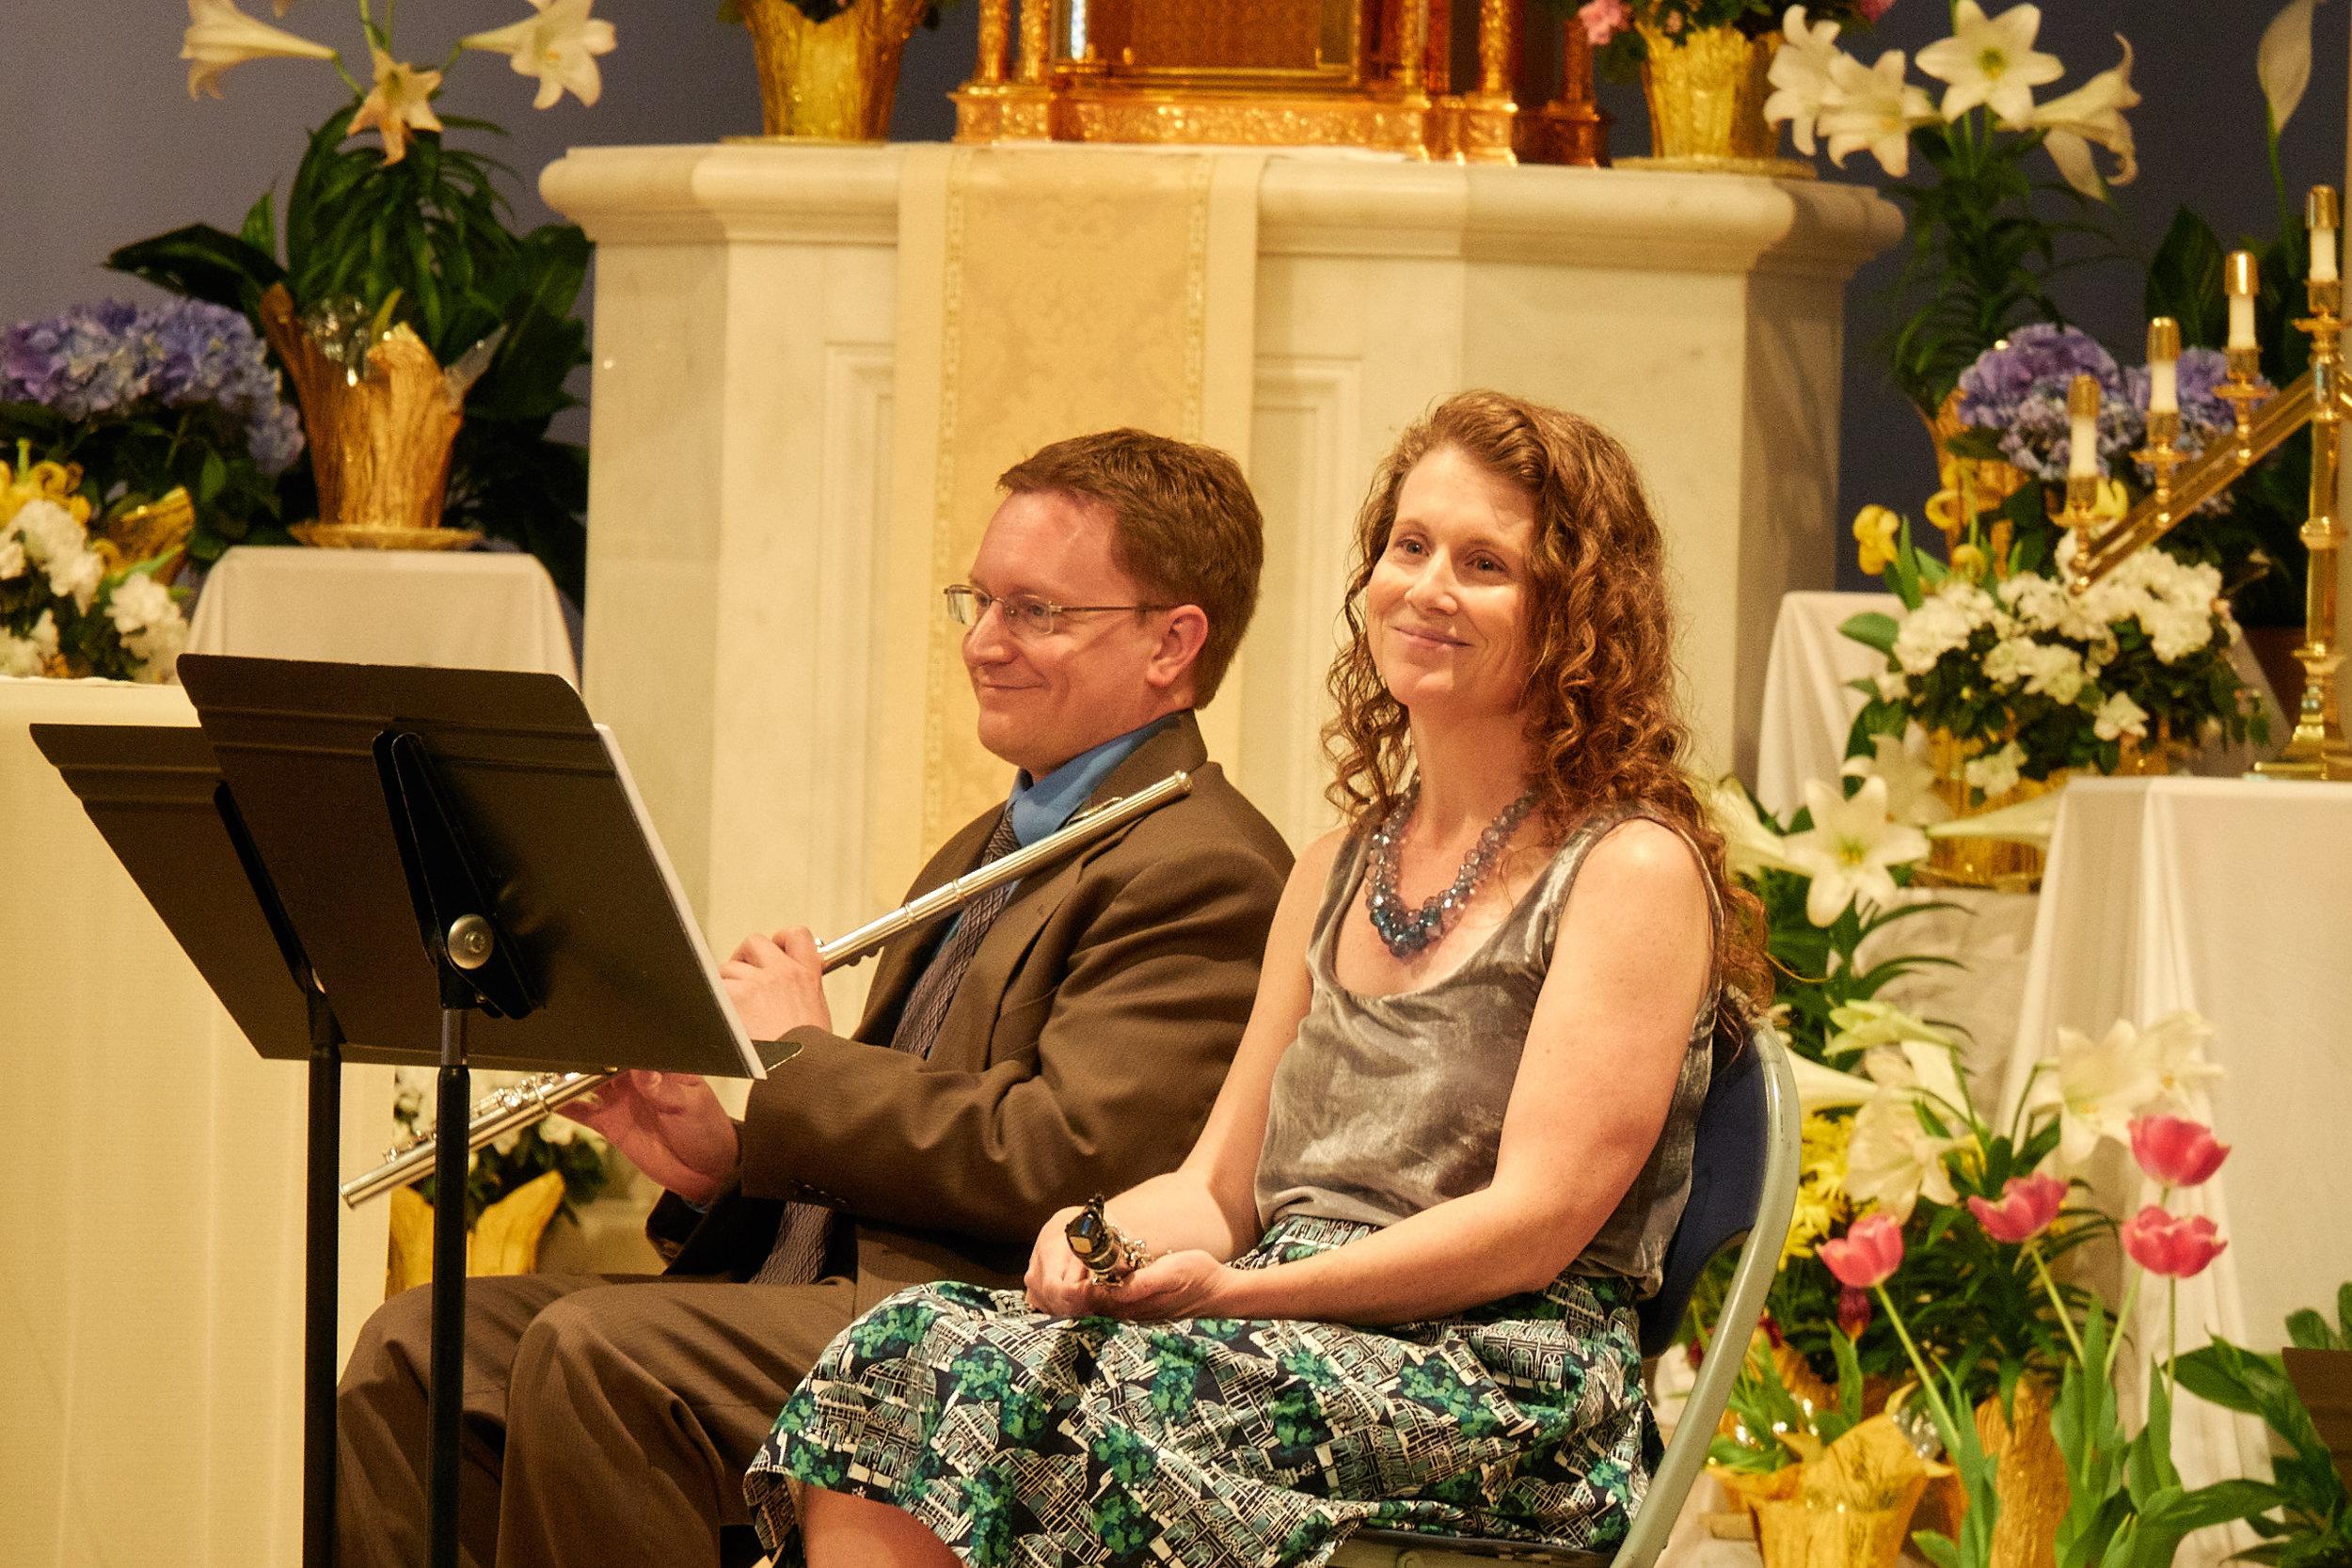 Denis Karp, flute, and Brooke Emery, clarinet